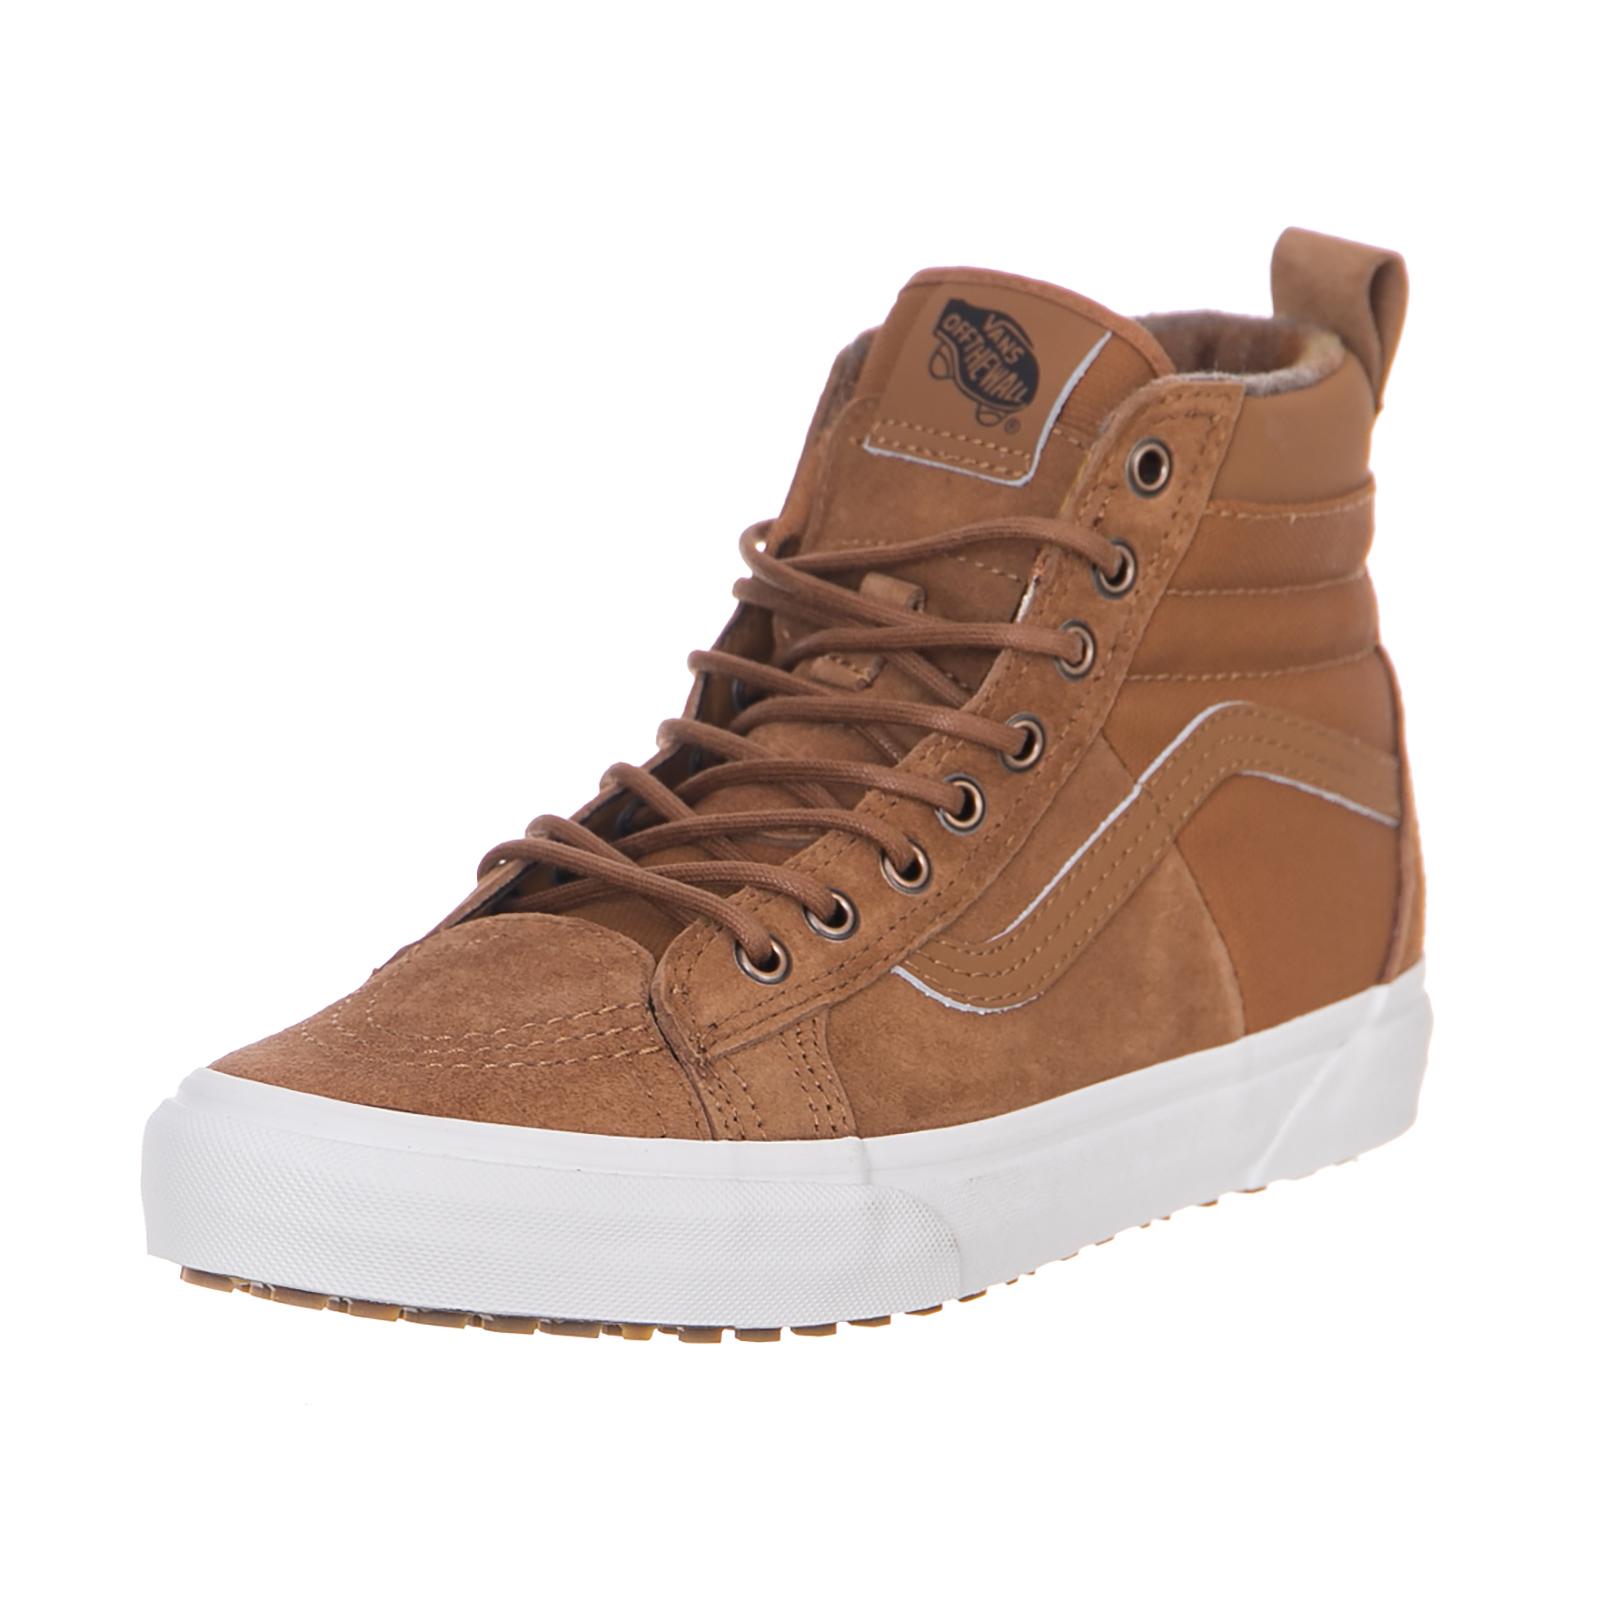 Vans 46 Sneakers Ua Sk8-Hi 46 Vans Mte Dx (Mte)Glazedgingr Flannel Marrone Scarpe classiche da uomo f30fff